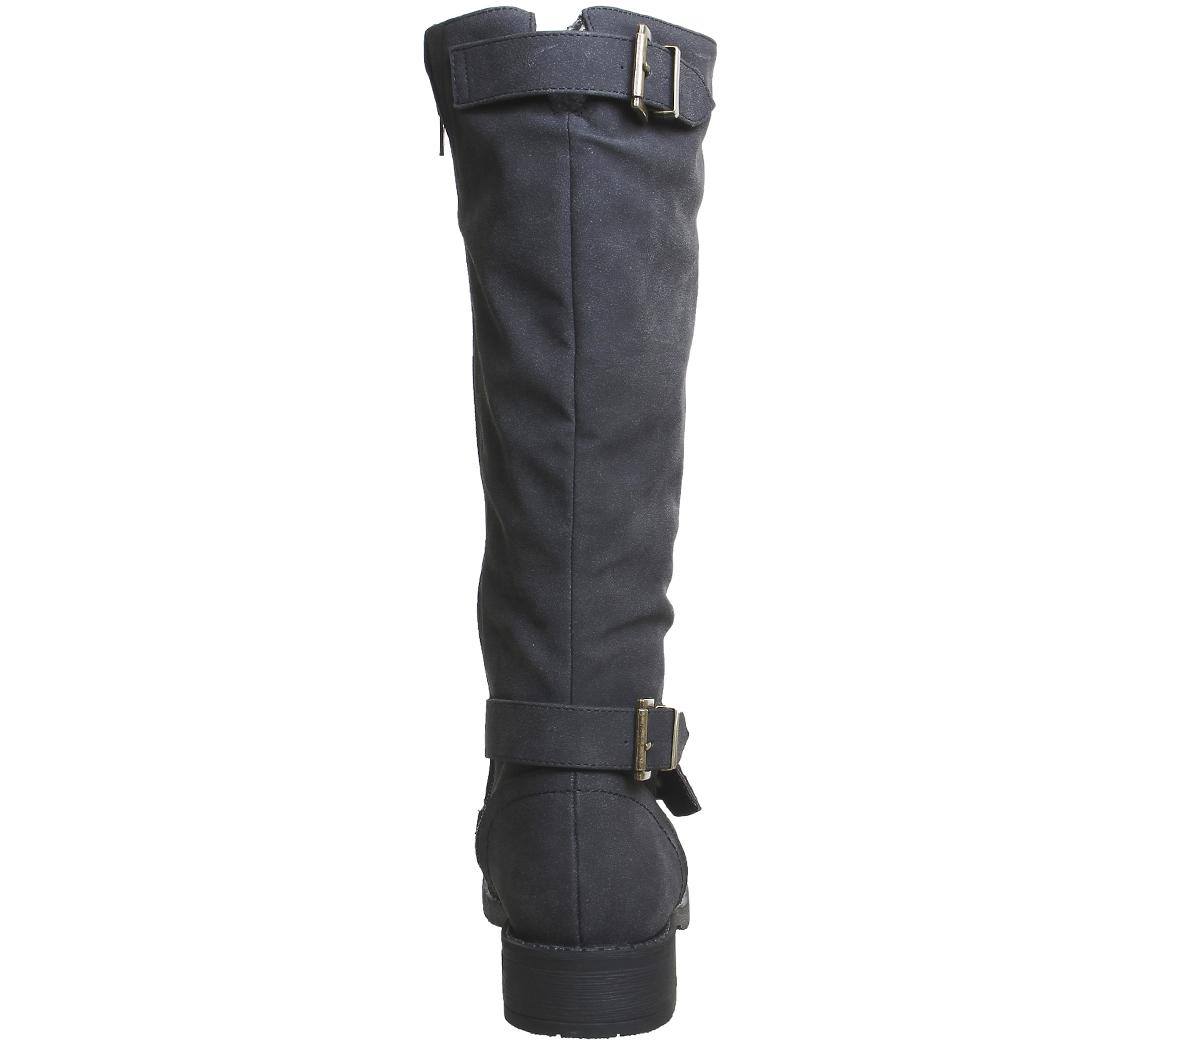 Foderato Womens Office Buckle Koala Biker nera pelliccia in Boots rXaqXRw6x